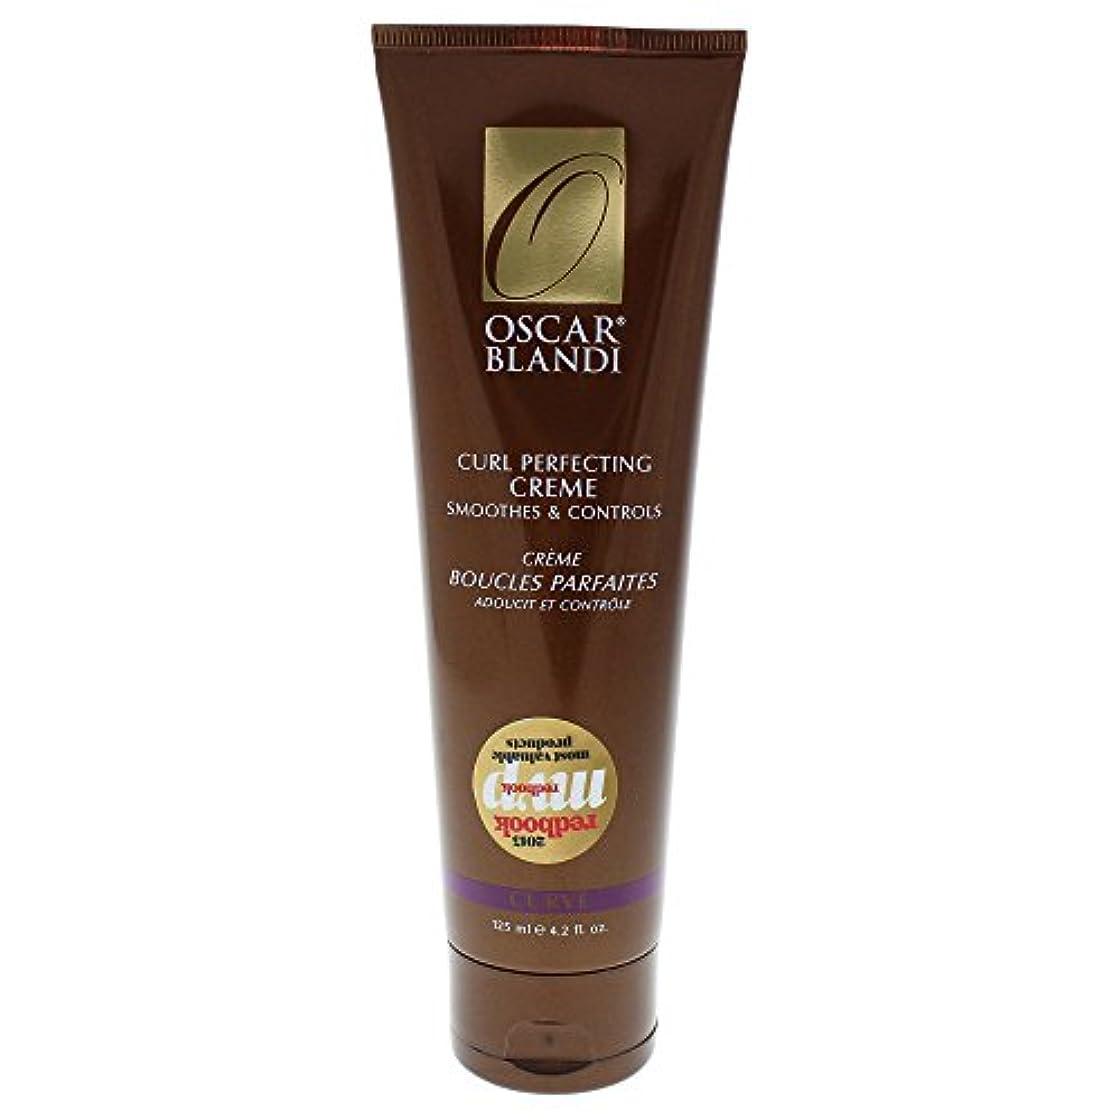 結晶コーヒー部分Oscar Blandi Curve Curl Perfecting Creme (並行輸入品) [並行輸入品]